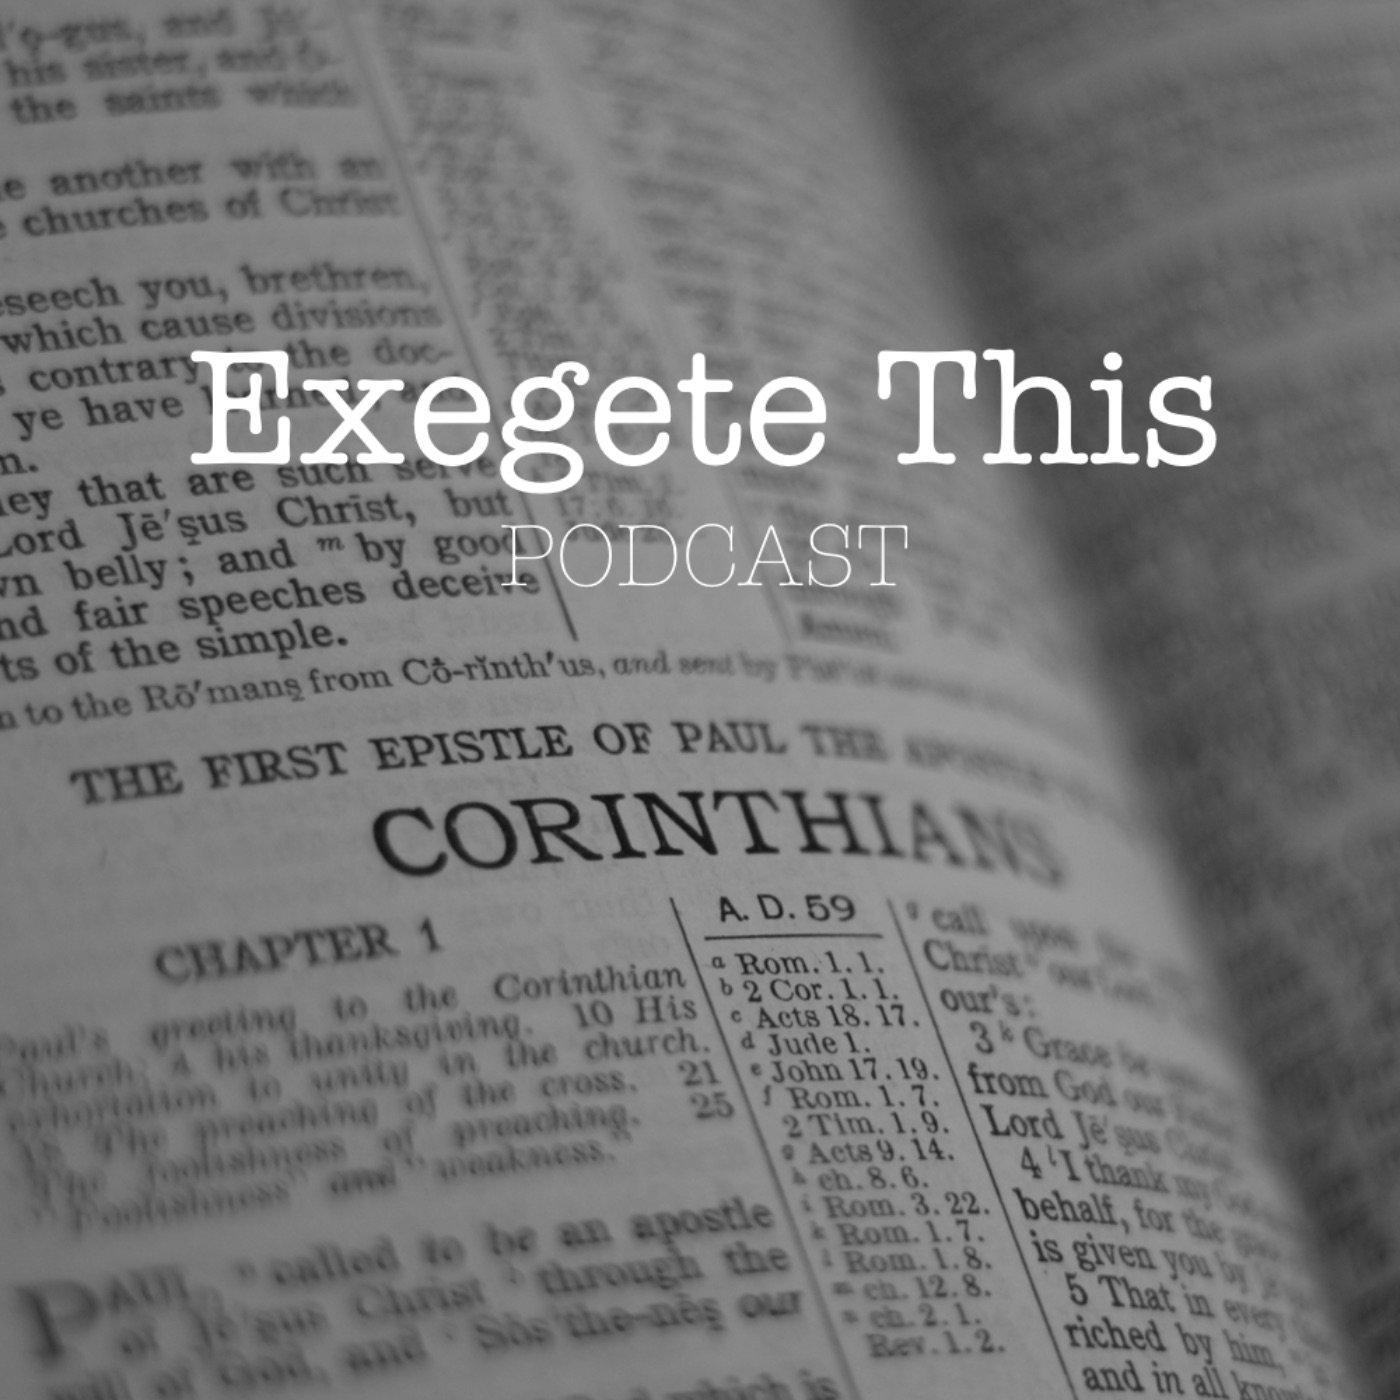 S1E8 - 1 Corinthians 7:17-40